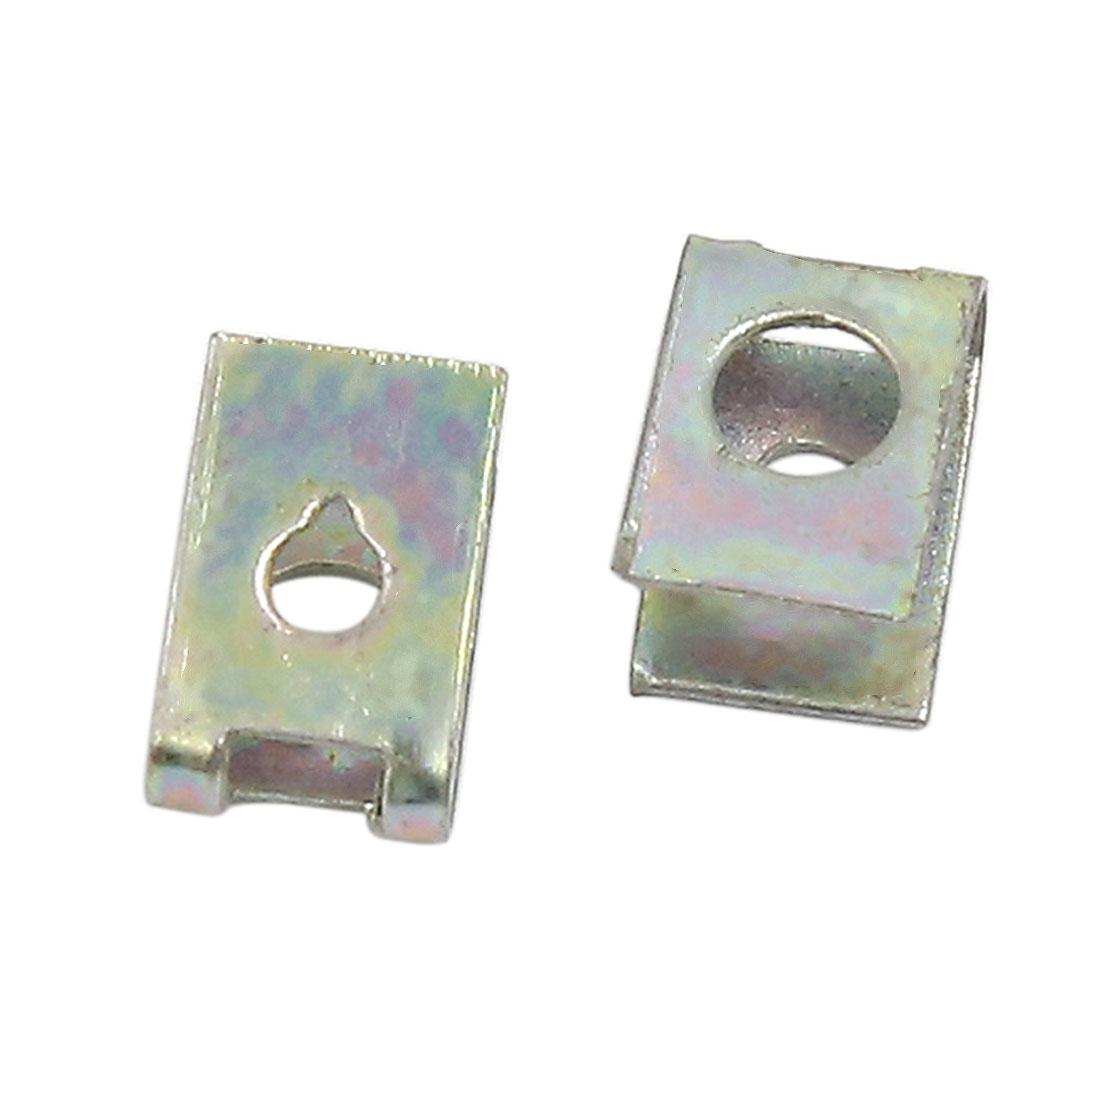 100 Pcs 5mm Hole Spring Metal Auto Car Door Pannel Spire Screw U-Type Trim Clips